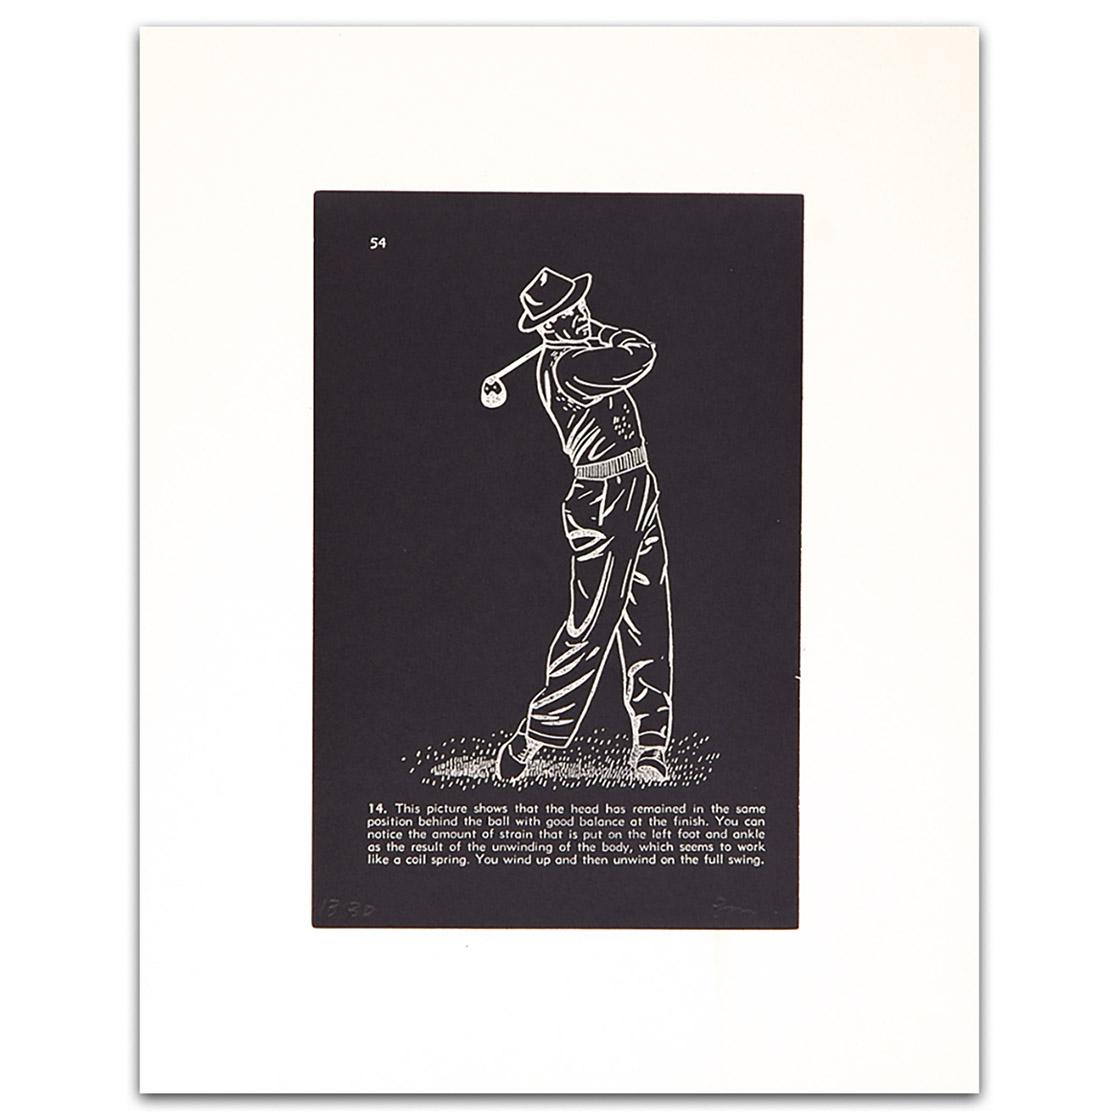 'Page.54' - Bill McCarroll at Kostuik Gallery